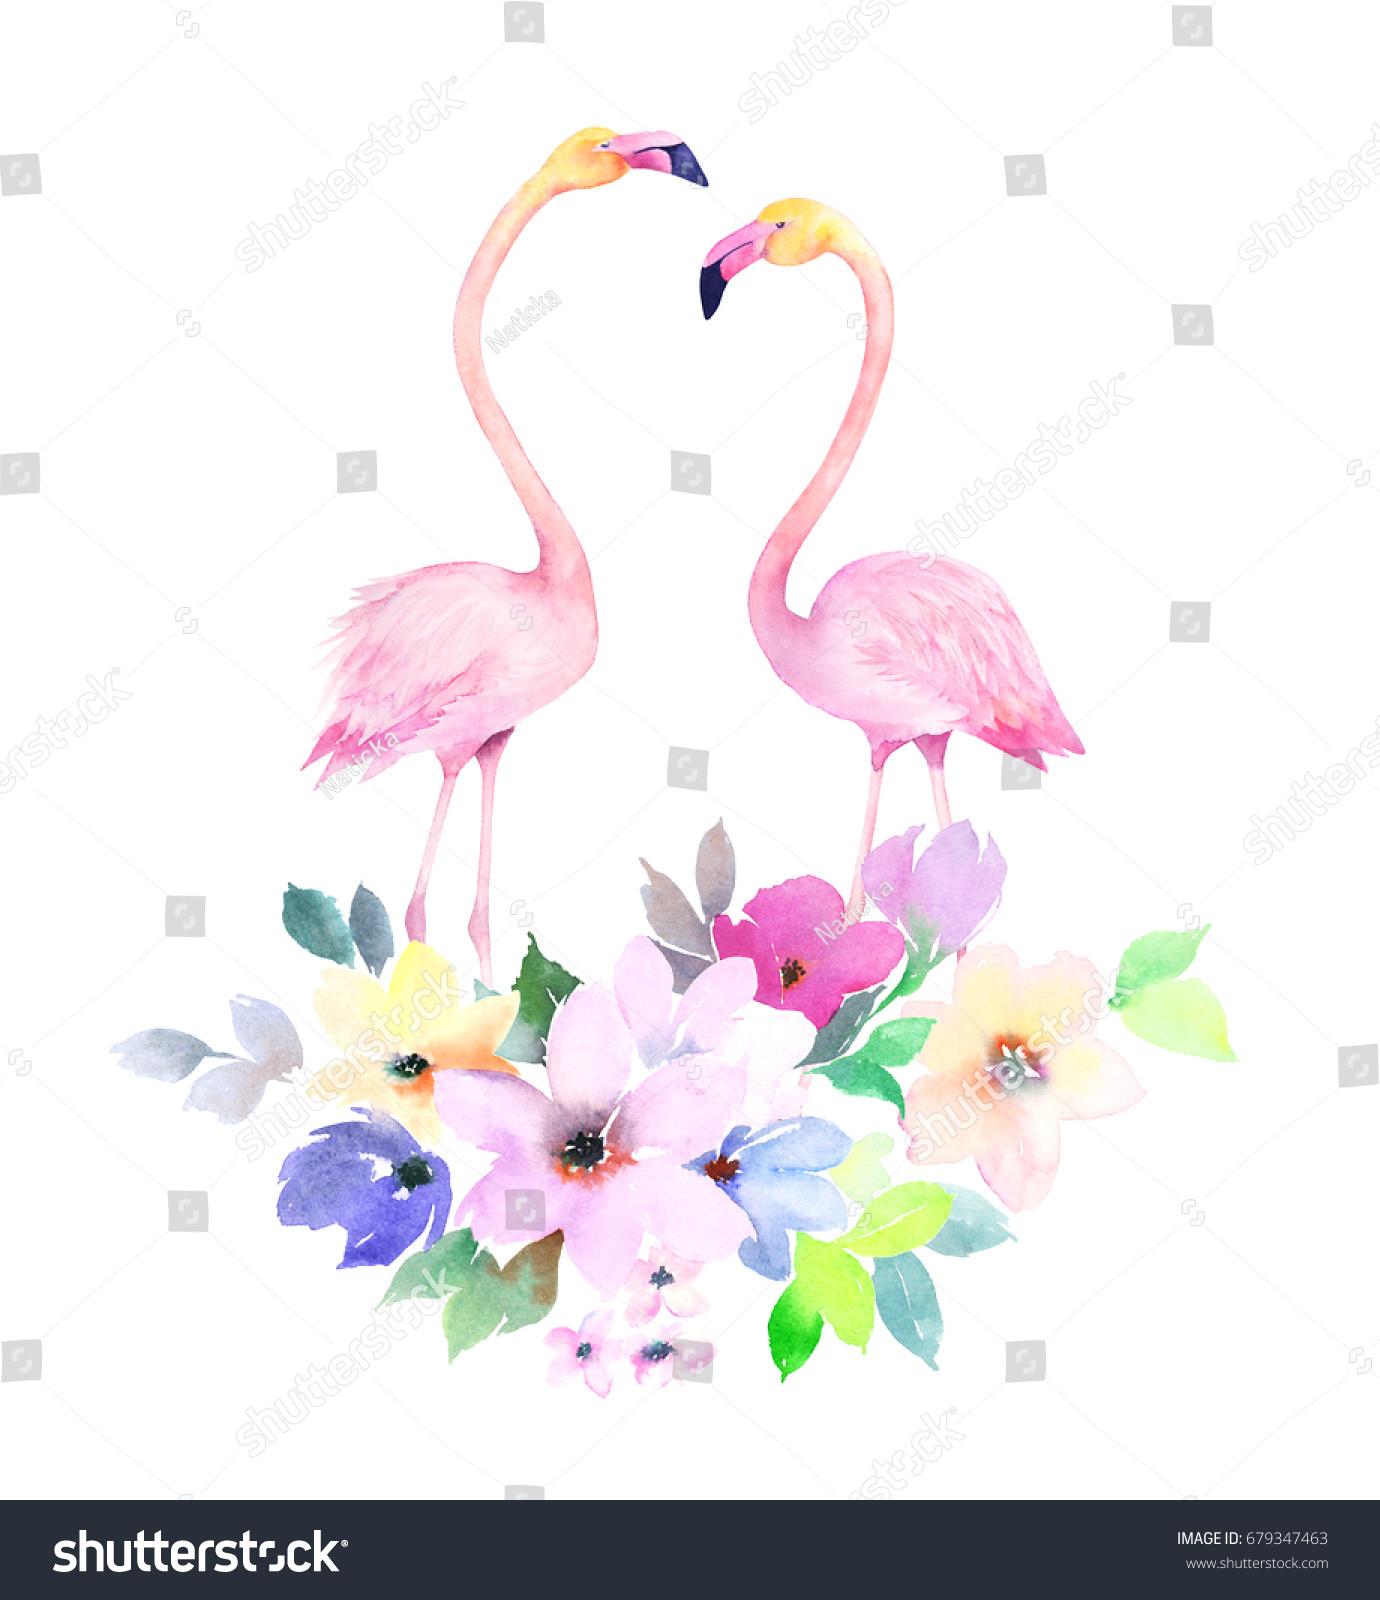 Couple Pink Flamingos Bouquet Flowers Watercolor Stock